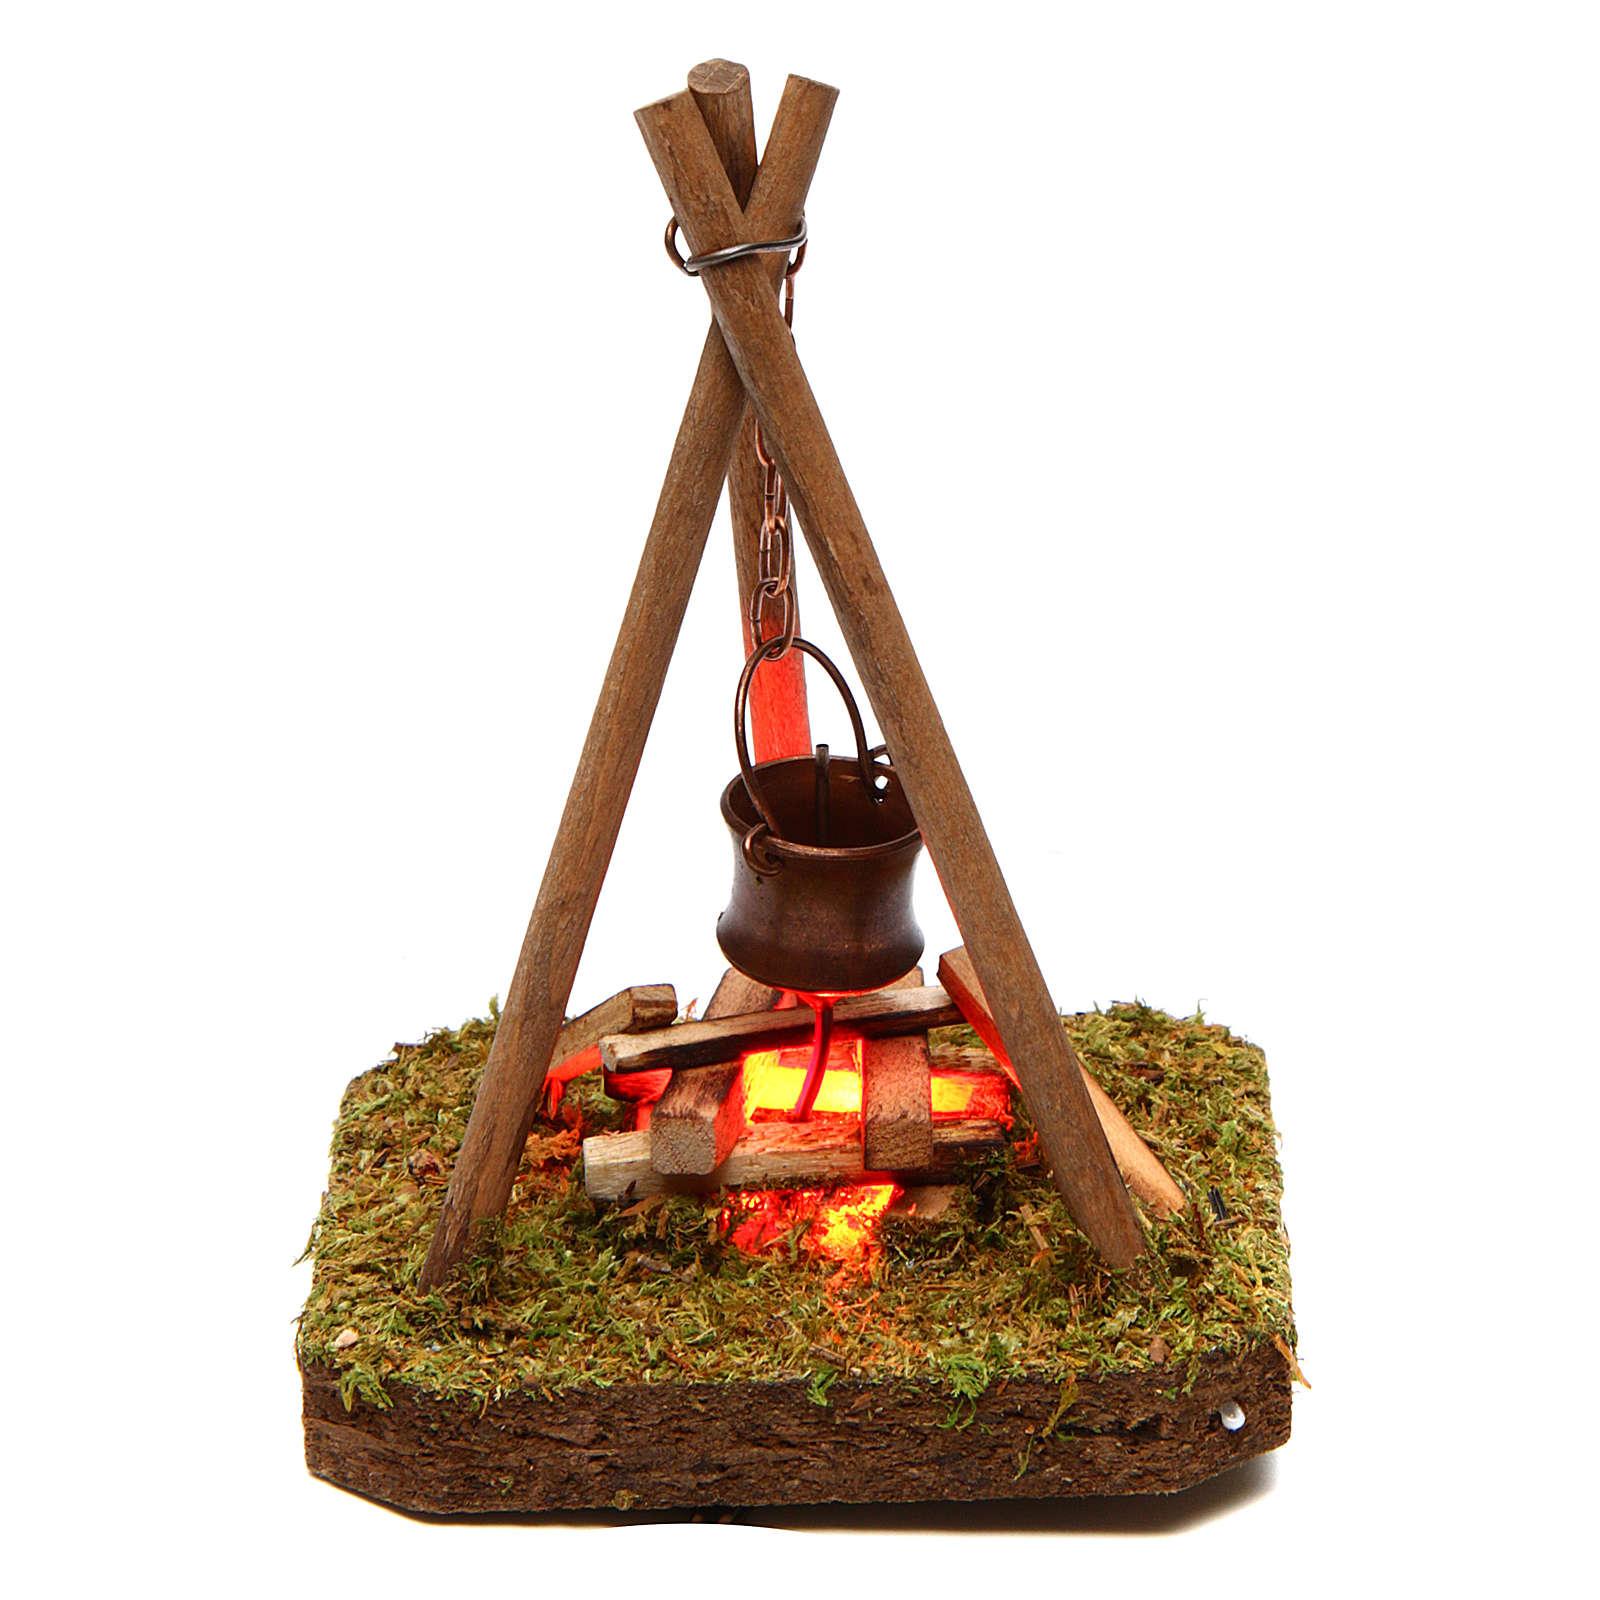 Nativity scene setting 10x10x10 cm pot on campfire 4,5 V 4